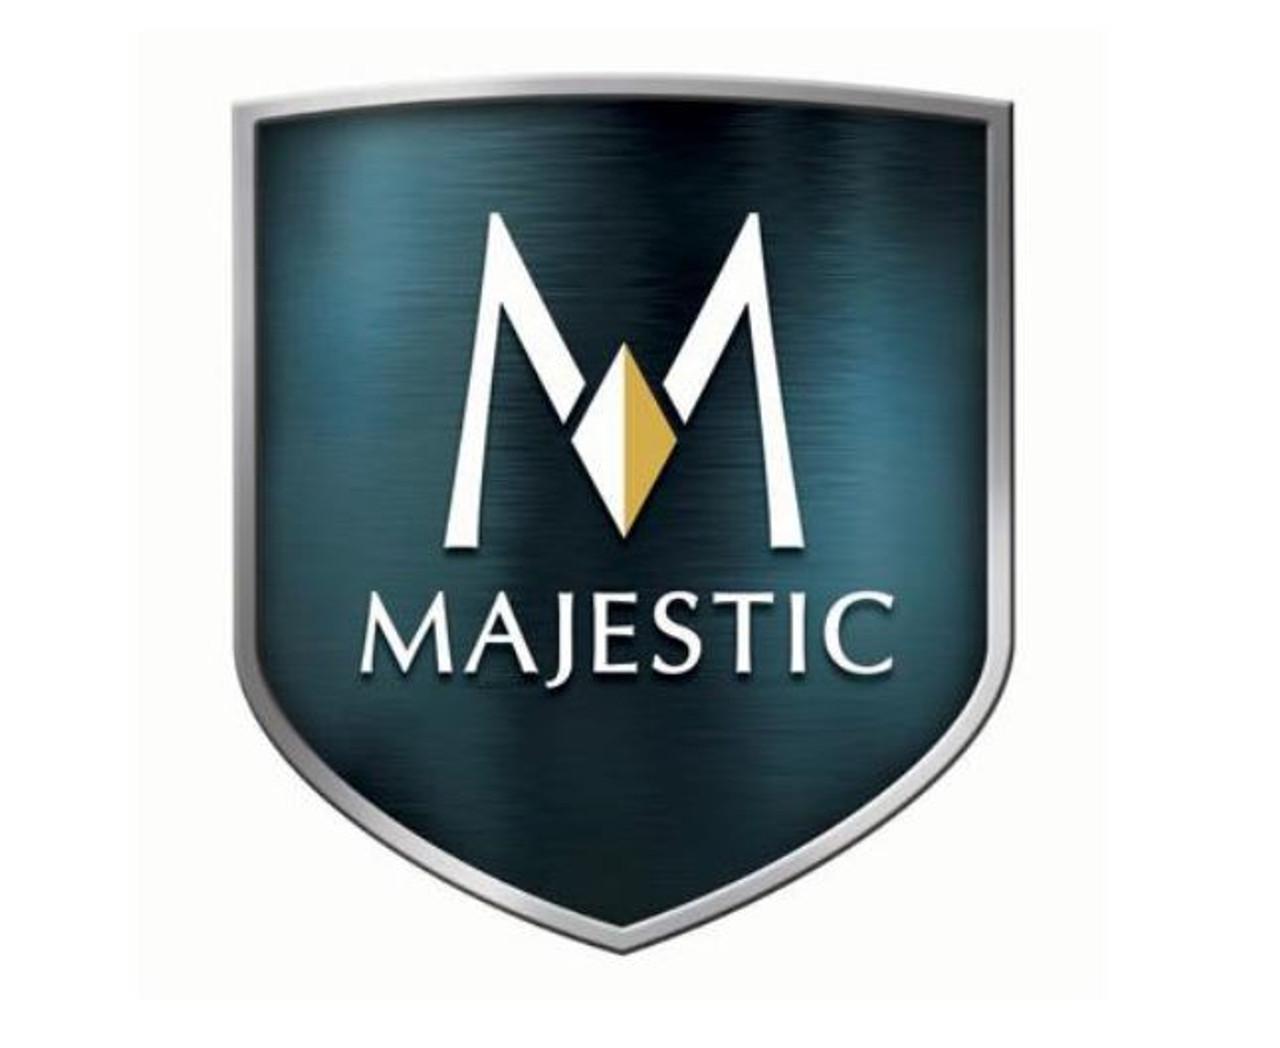 "Majestic  24"" Length Round Rigid Pipe - 5GV24 (Gas Fireplace - 5"" B-Vent)"